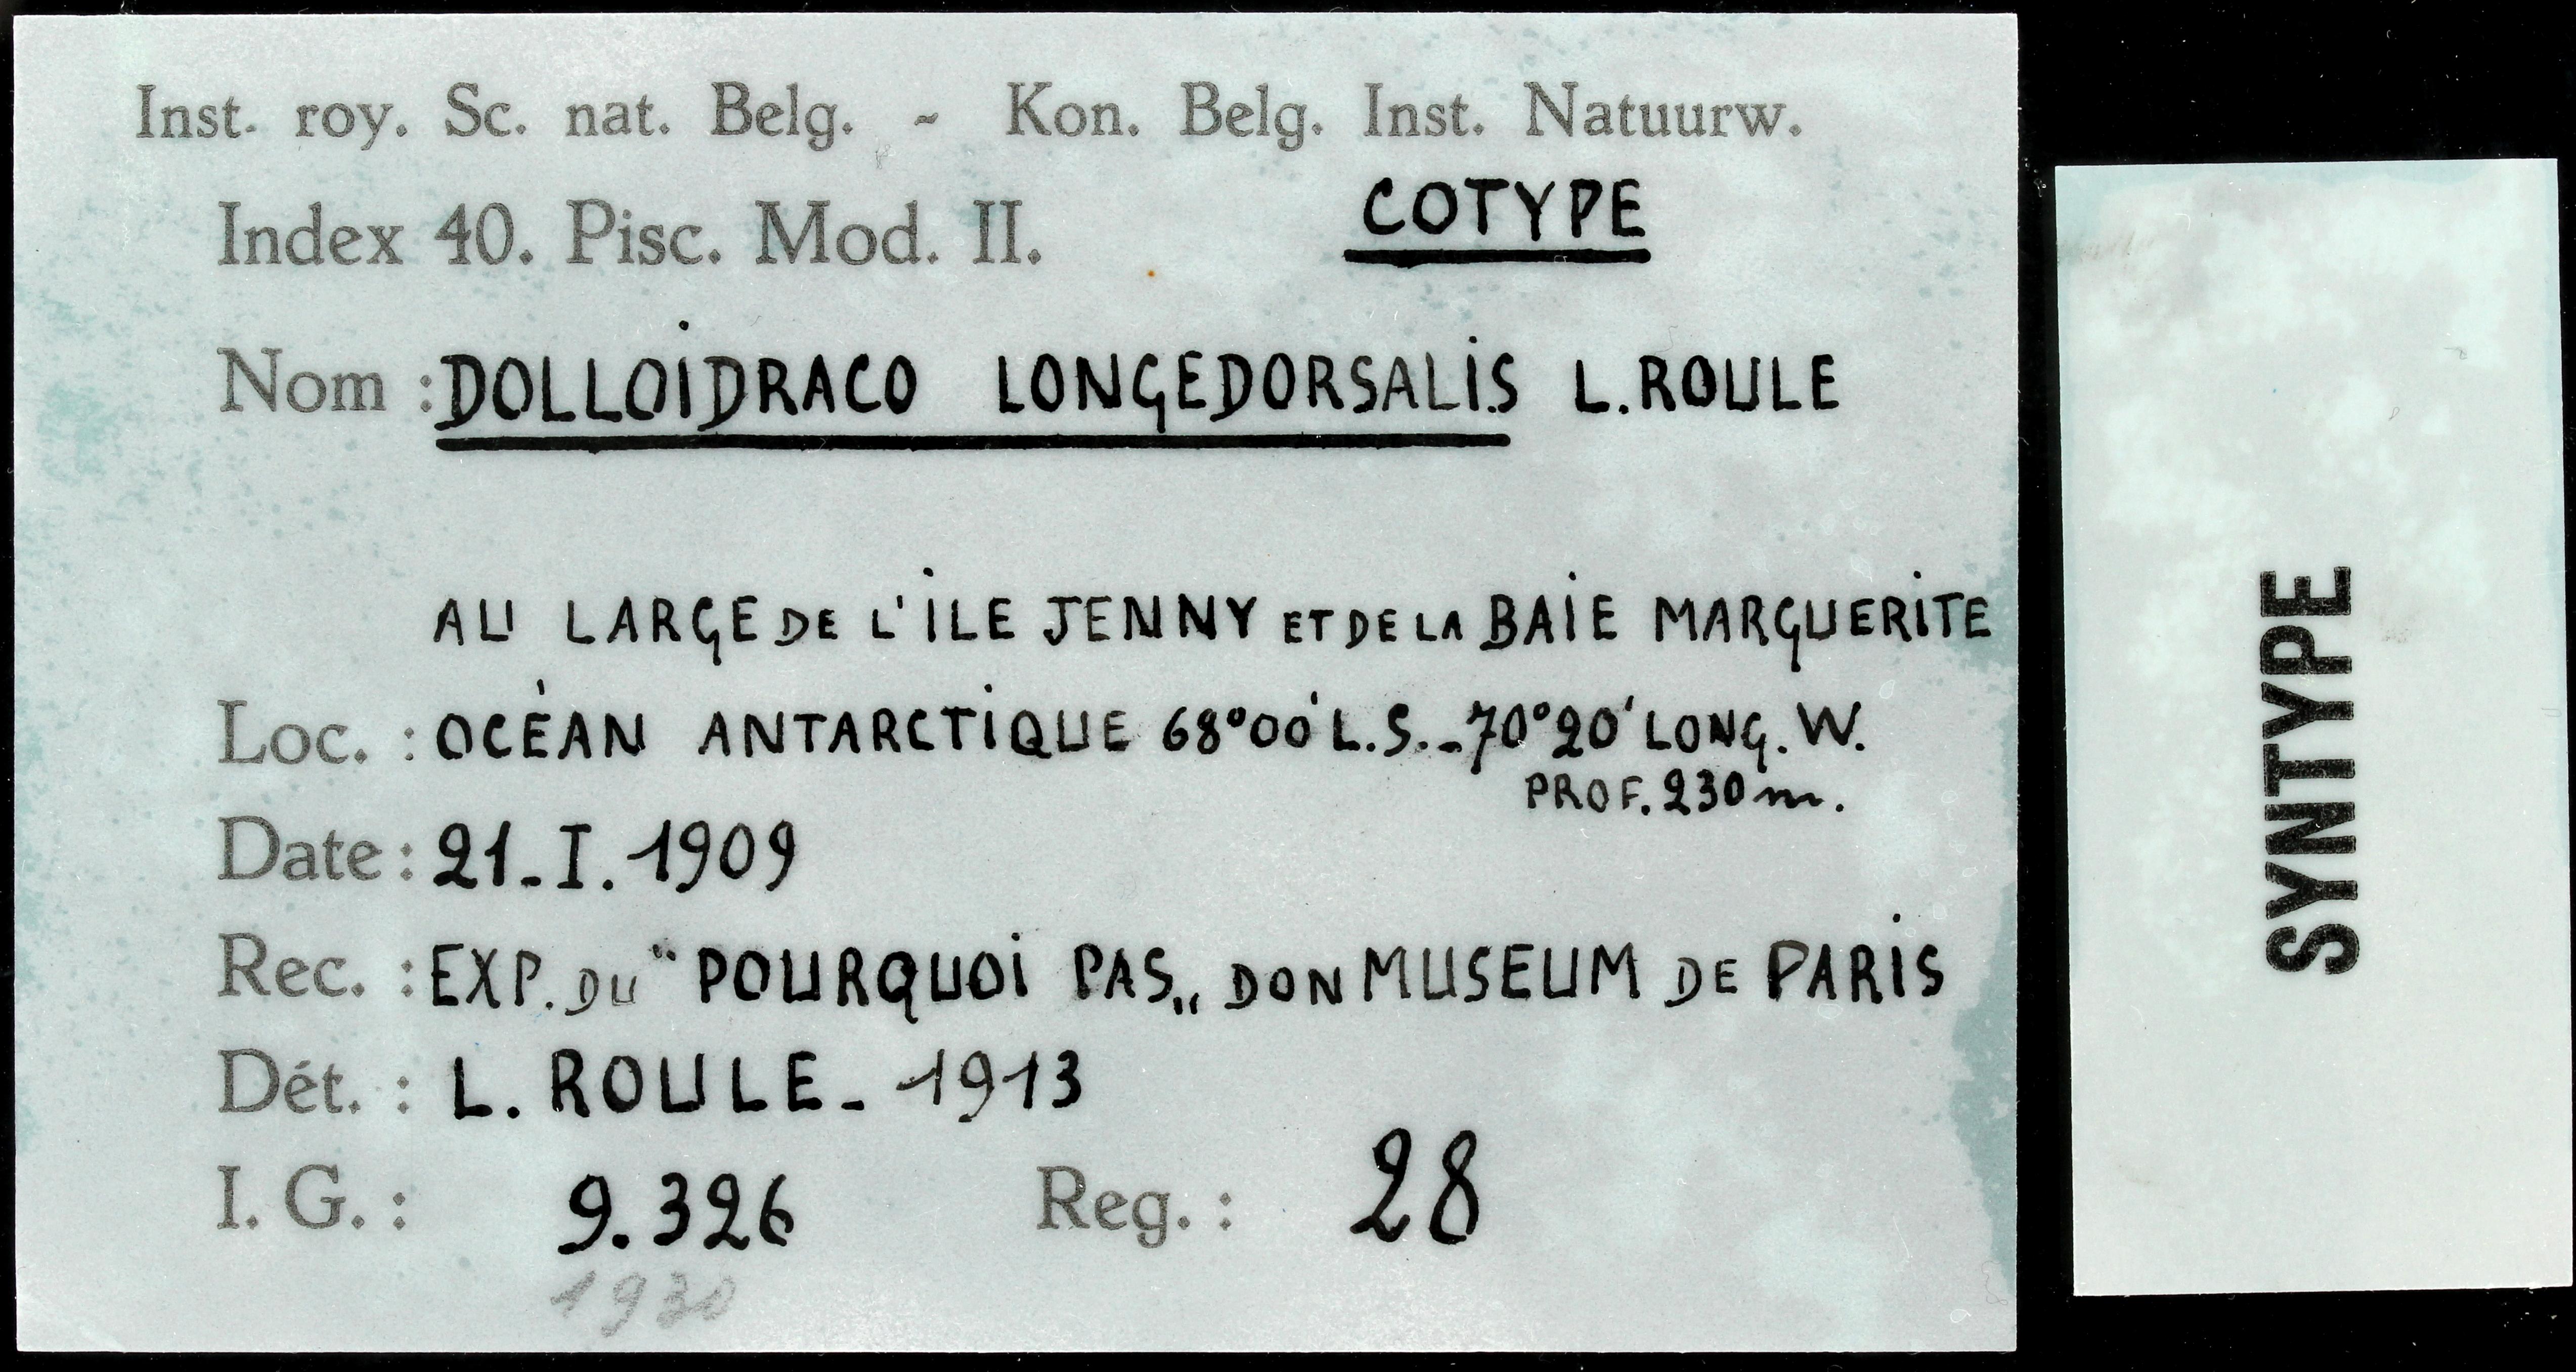 28 Dolloidraco longedorsalis 9326 ticket.JPG